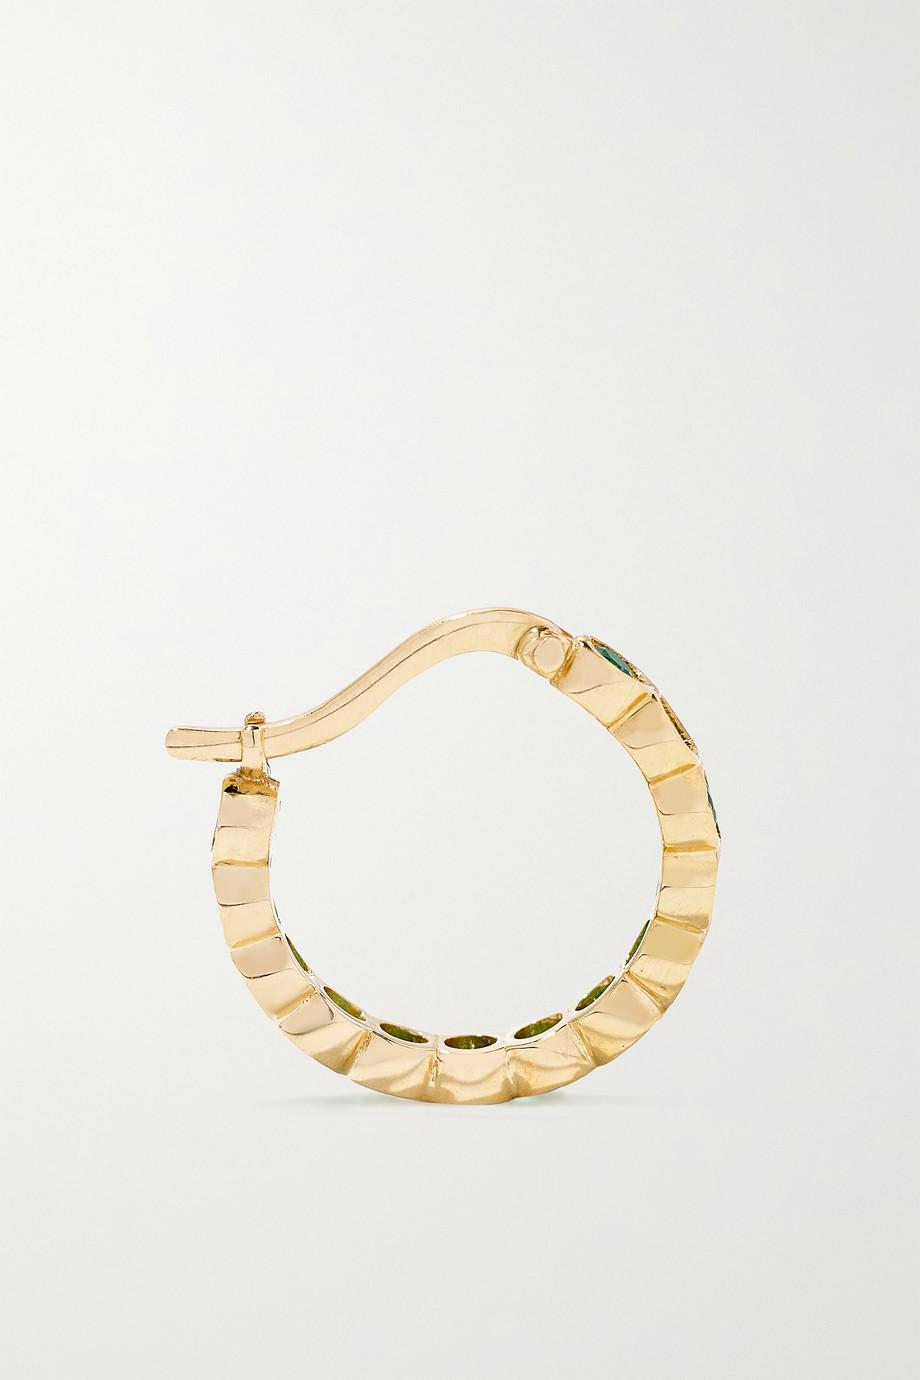 Octavia Elizabeth + NET SUSTAIN Petite Chloe recycled 18-karat gold emerald hoop earrings